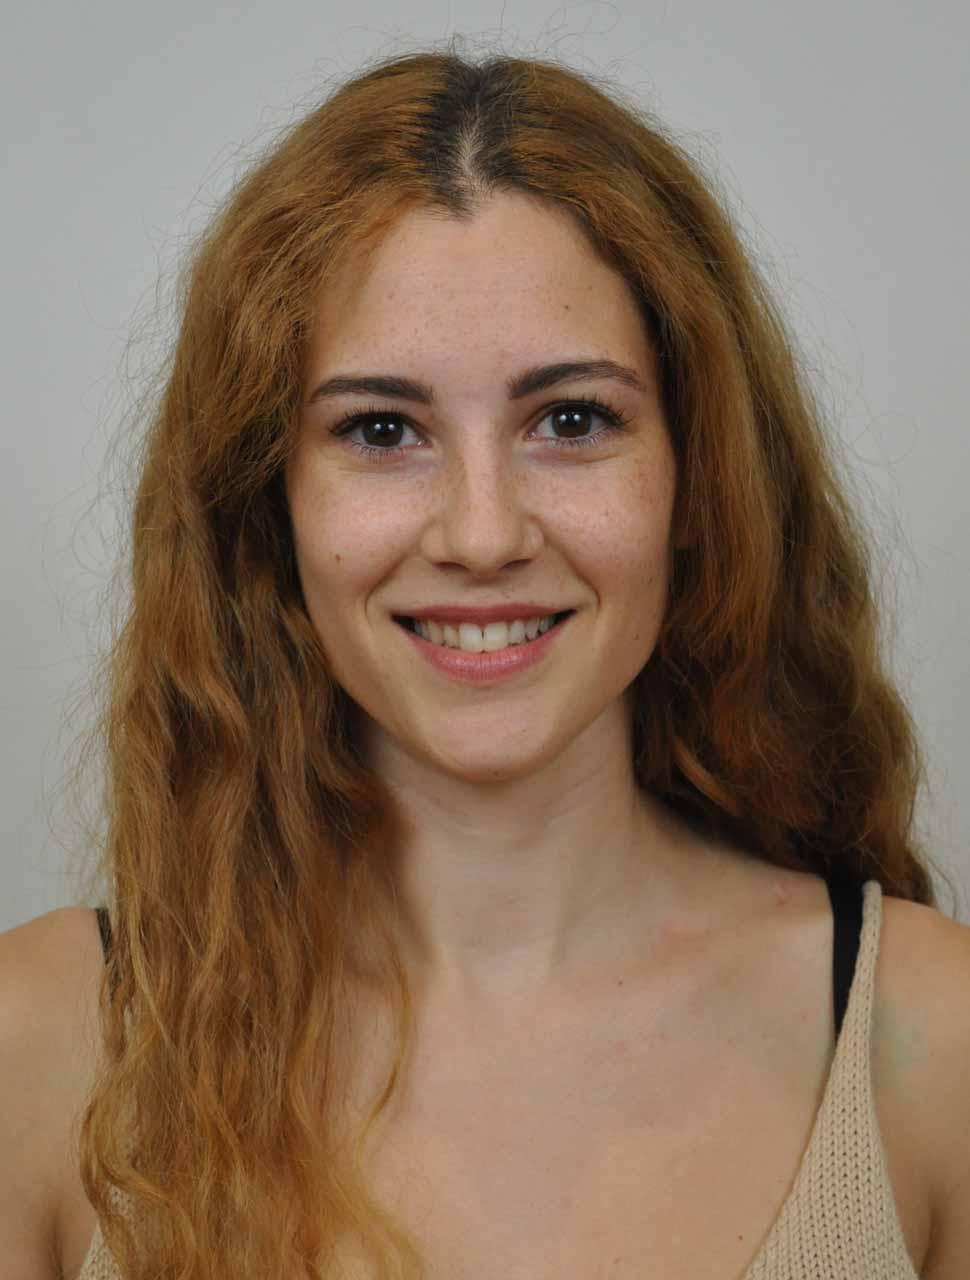 Rafaela Loudianou